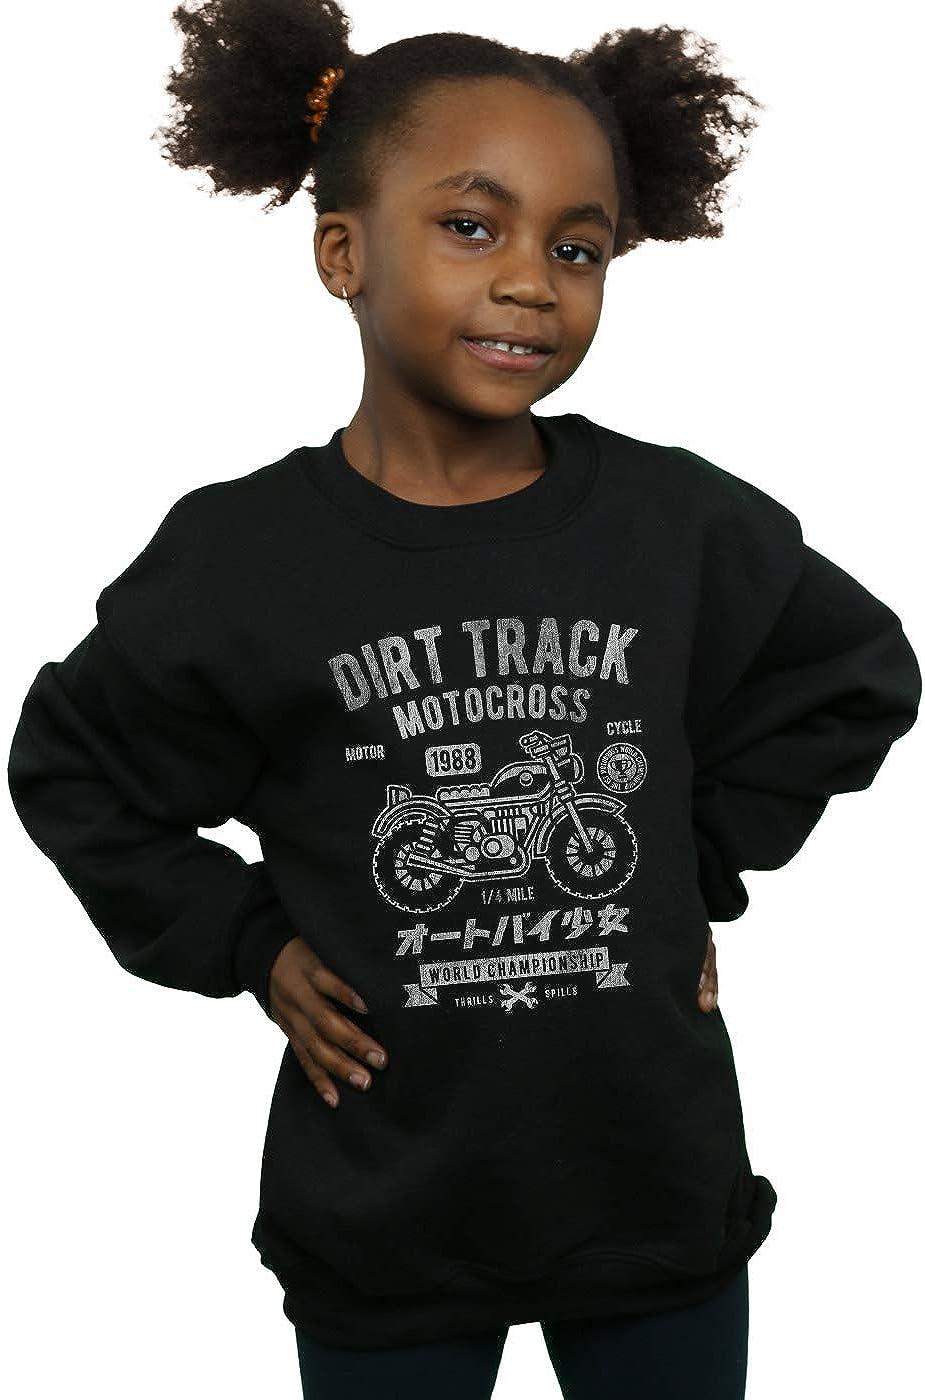 Absolute Cult Drewbacca Girls Dirt Track Motocross Sweatshirt